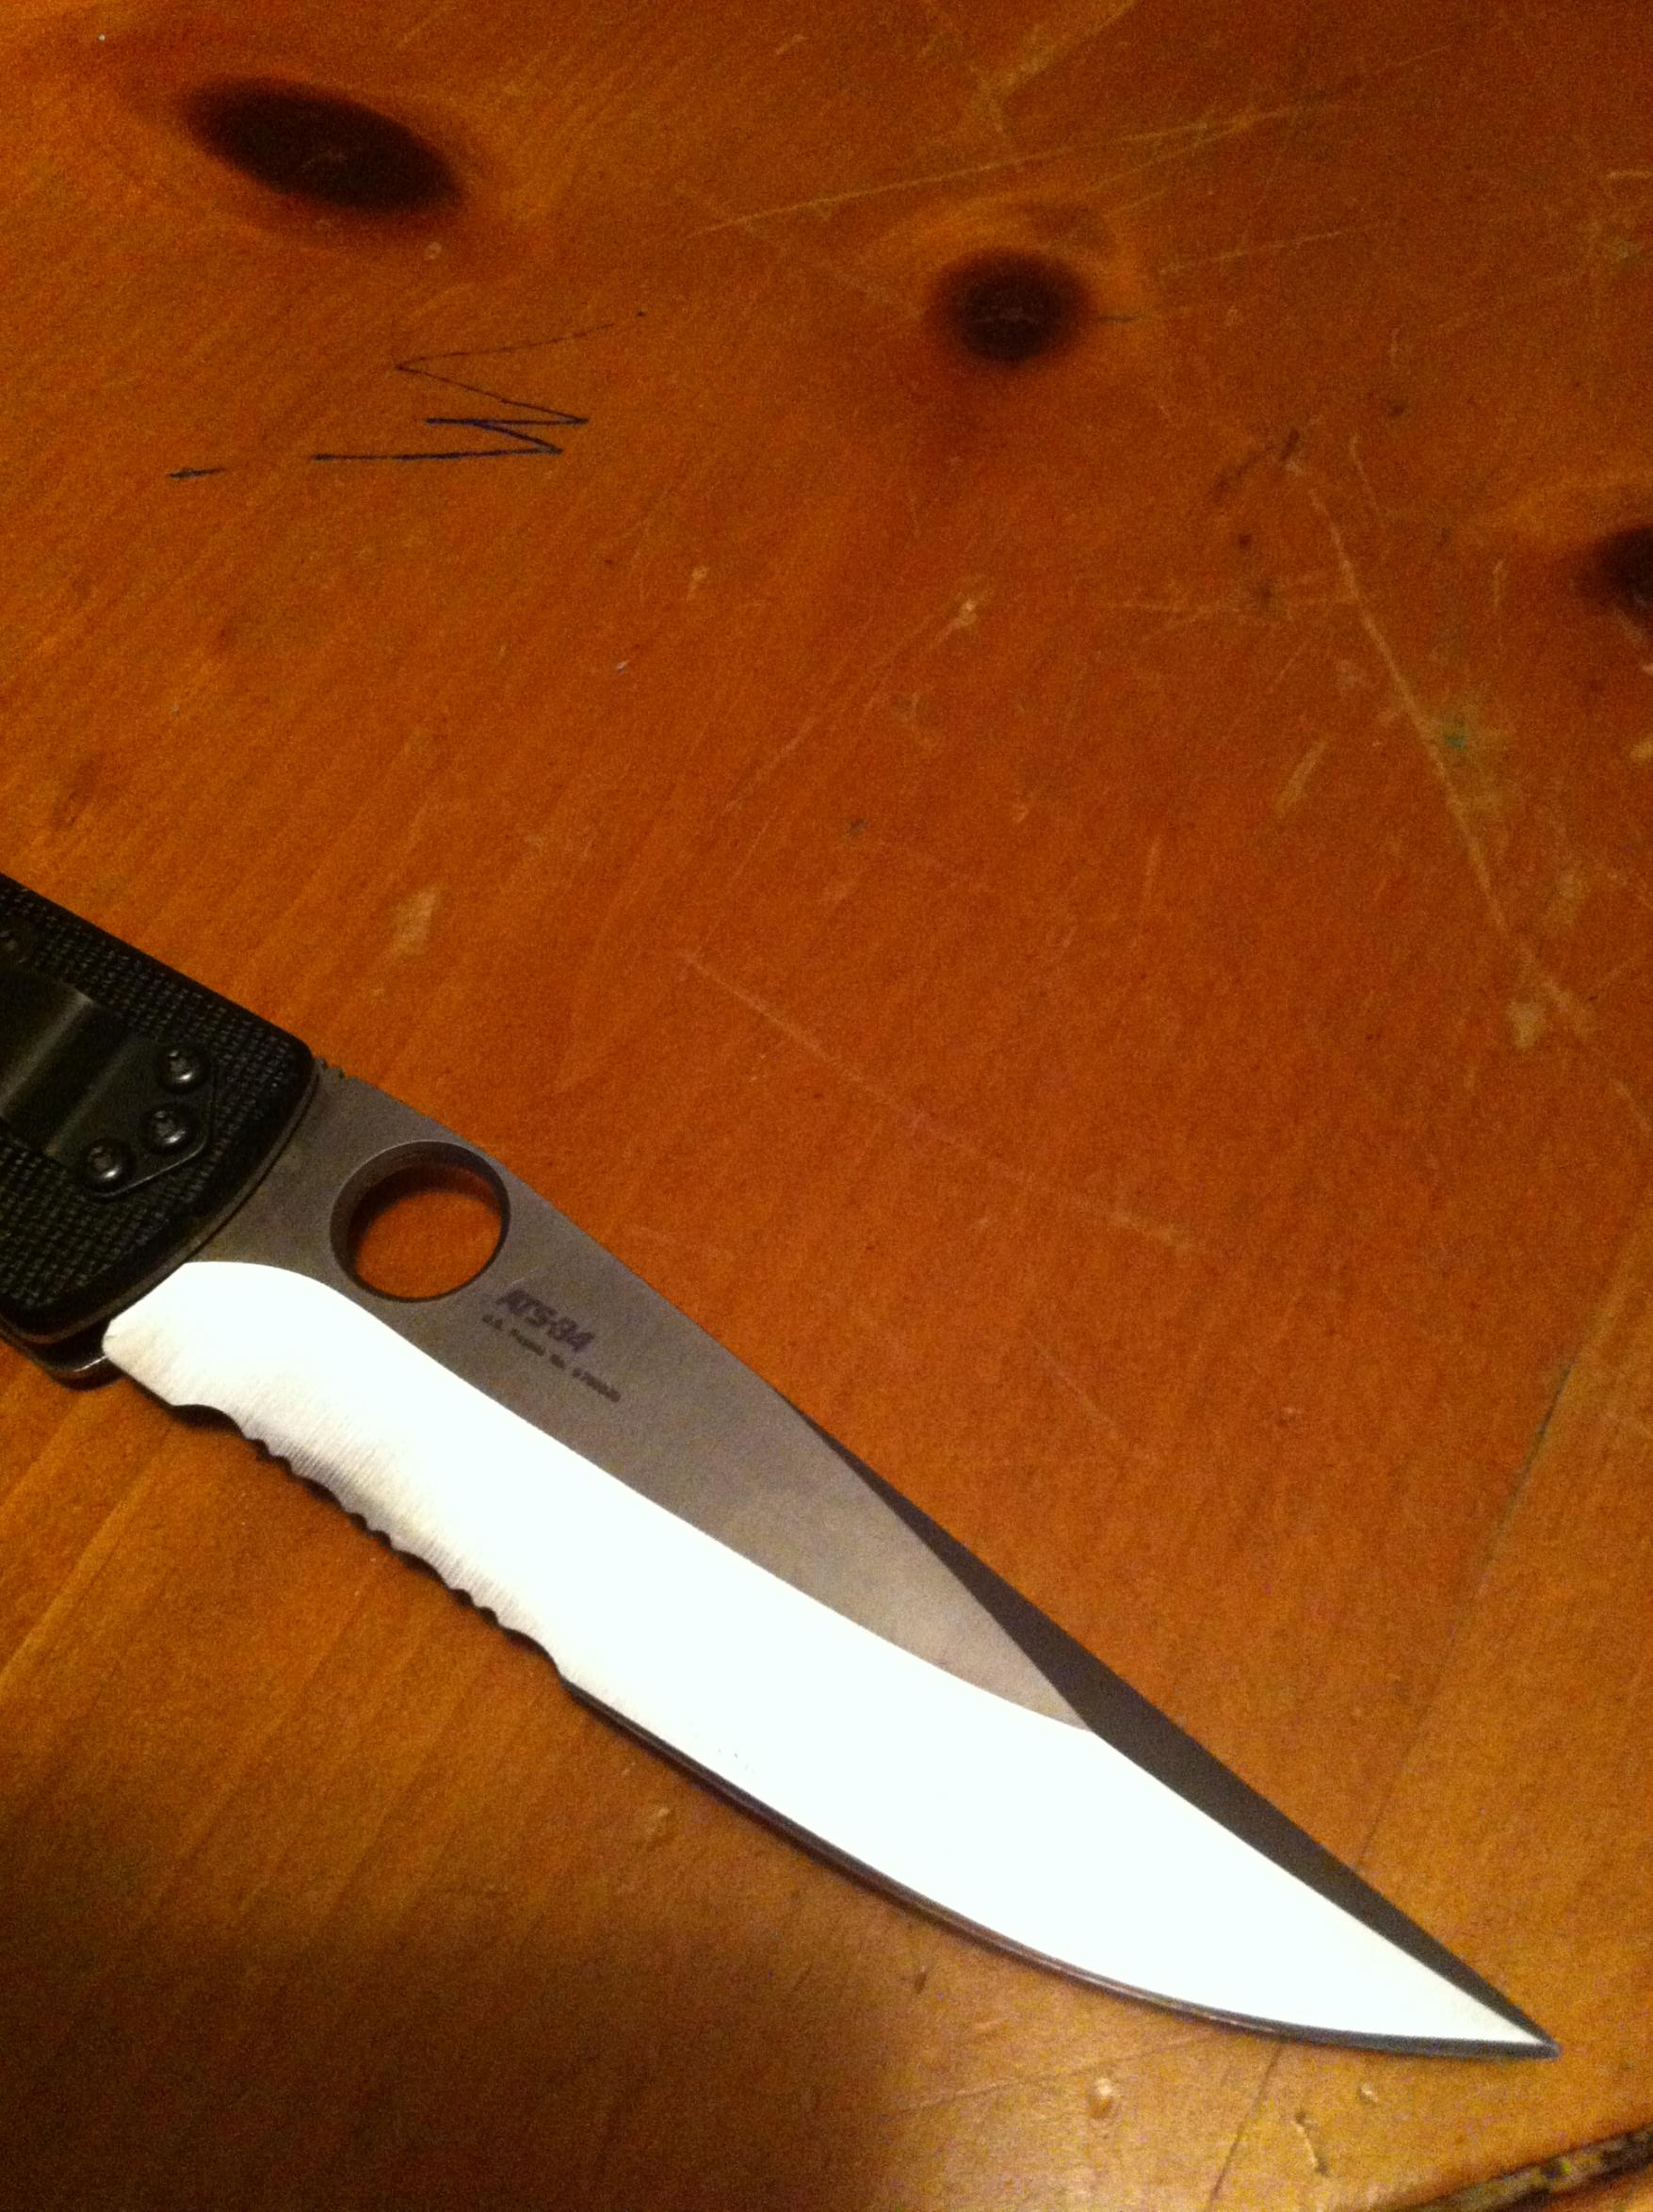 Benchmade AFCK folding knife-006.jpg